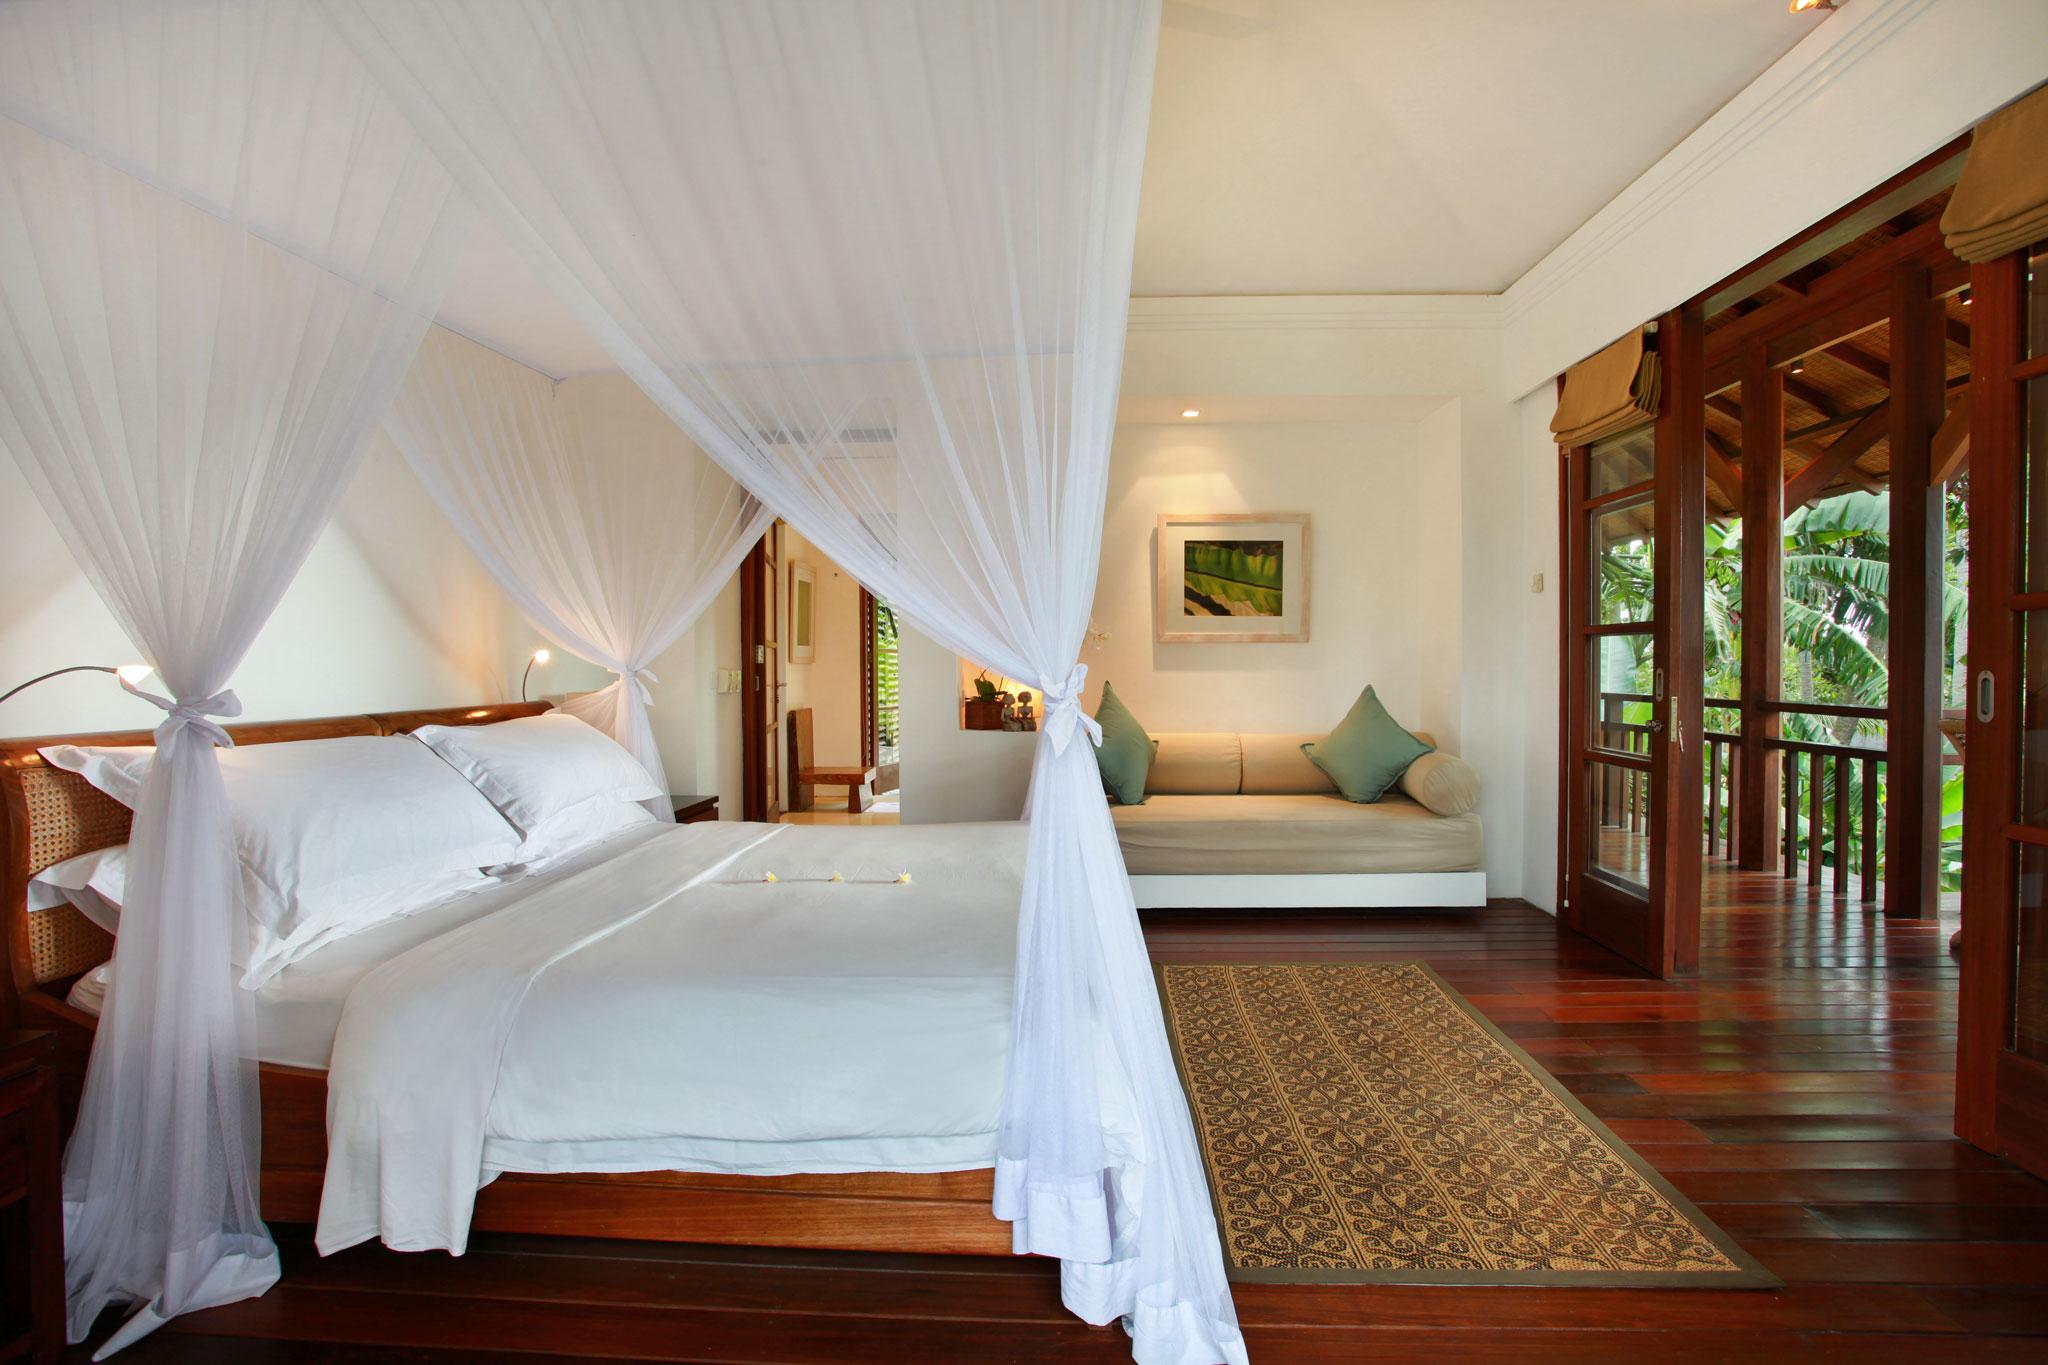 villa-kemah-tinggi-desa-bedroom7215